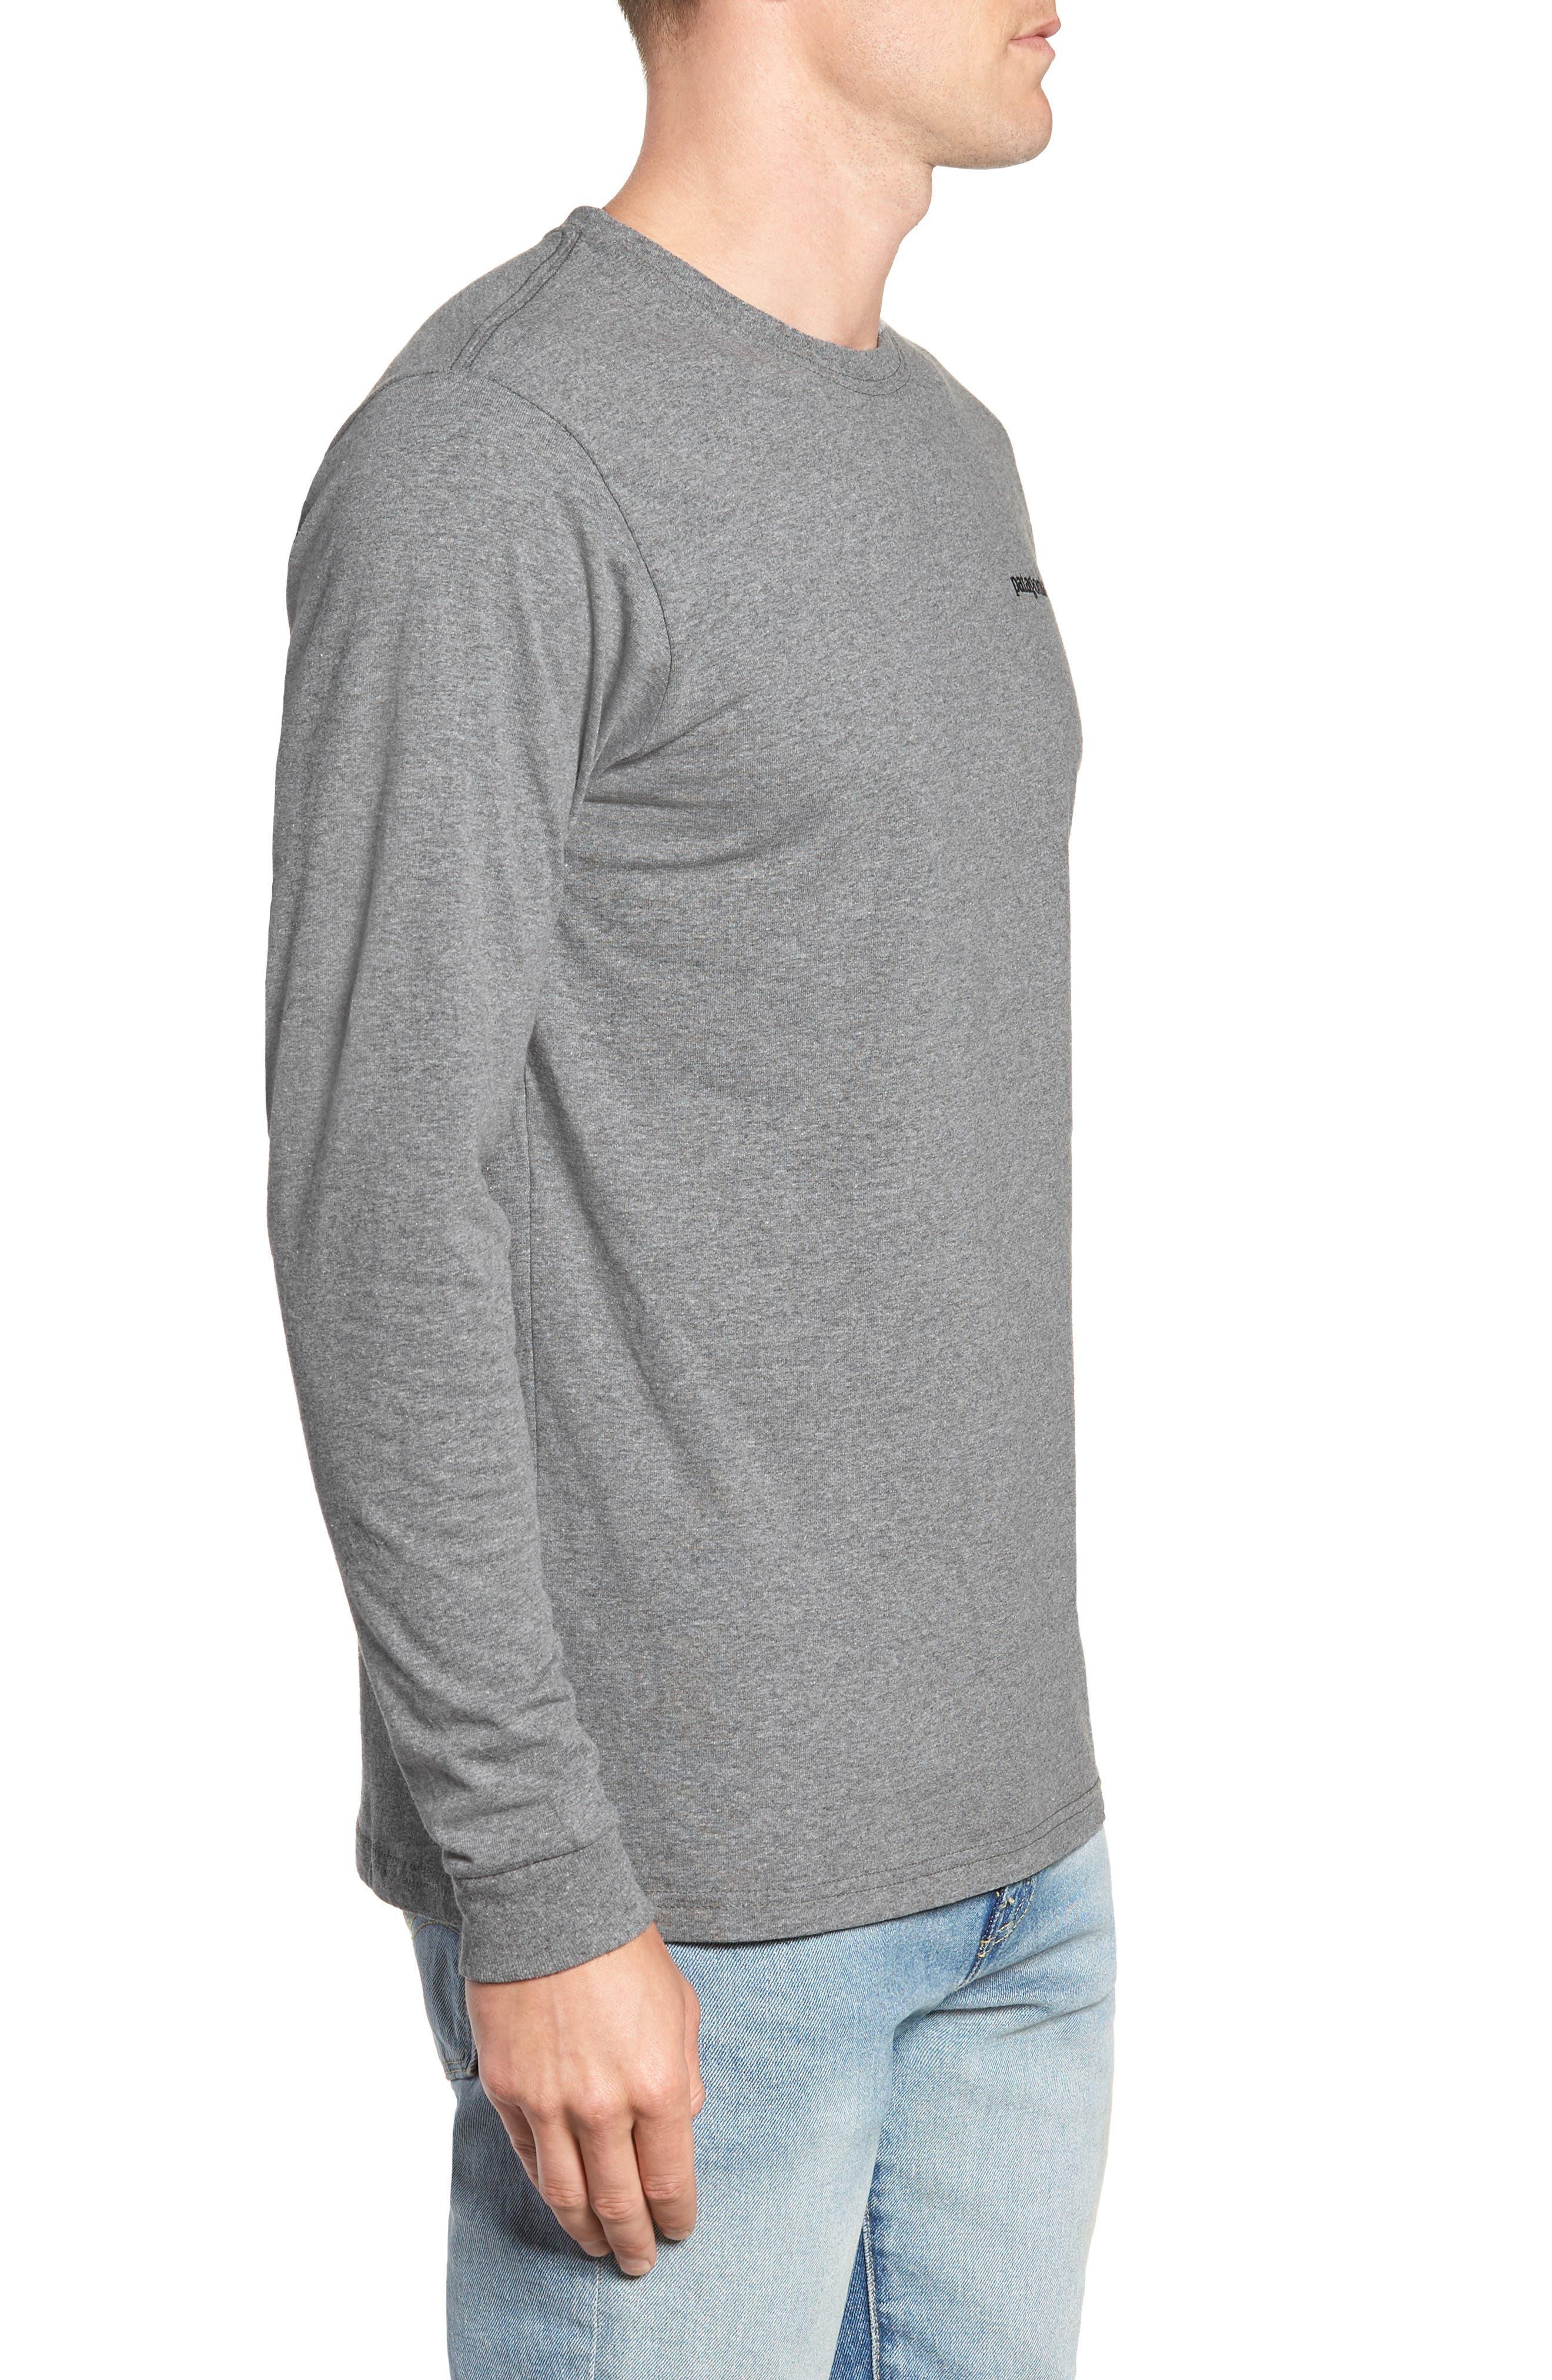 PATAGONIA,                             Fitz Roy Responsibili-Tee Long-Sleeve T-Shirt,                             Alternate thumbnail 3, color,                             020